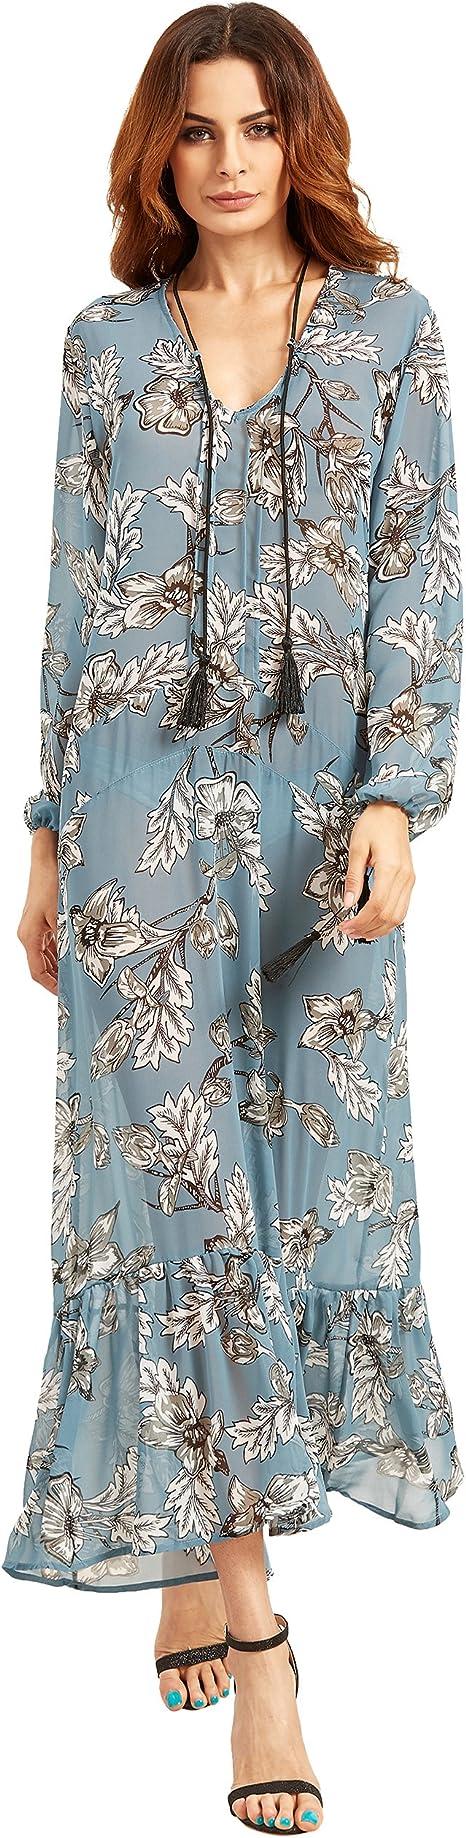 SheIn Damen Tunika Kleid Gr. S, blau  Amazon.de Bekleidung